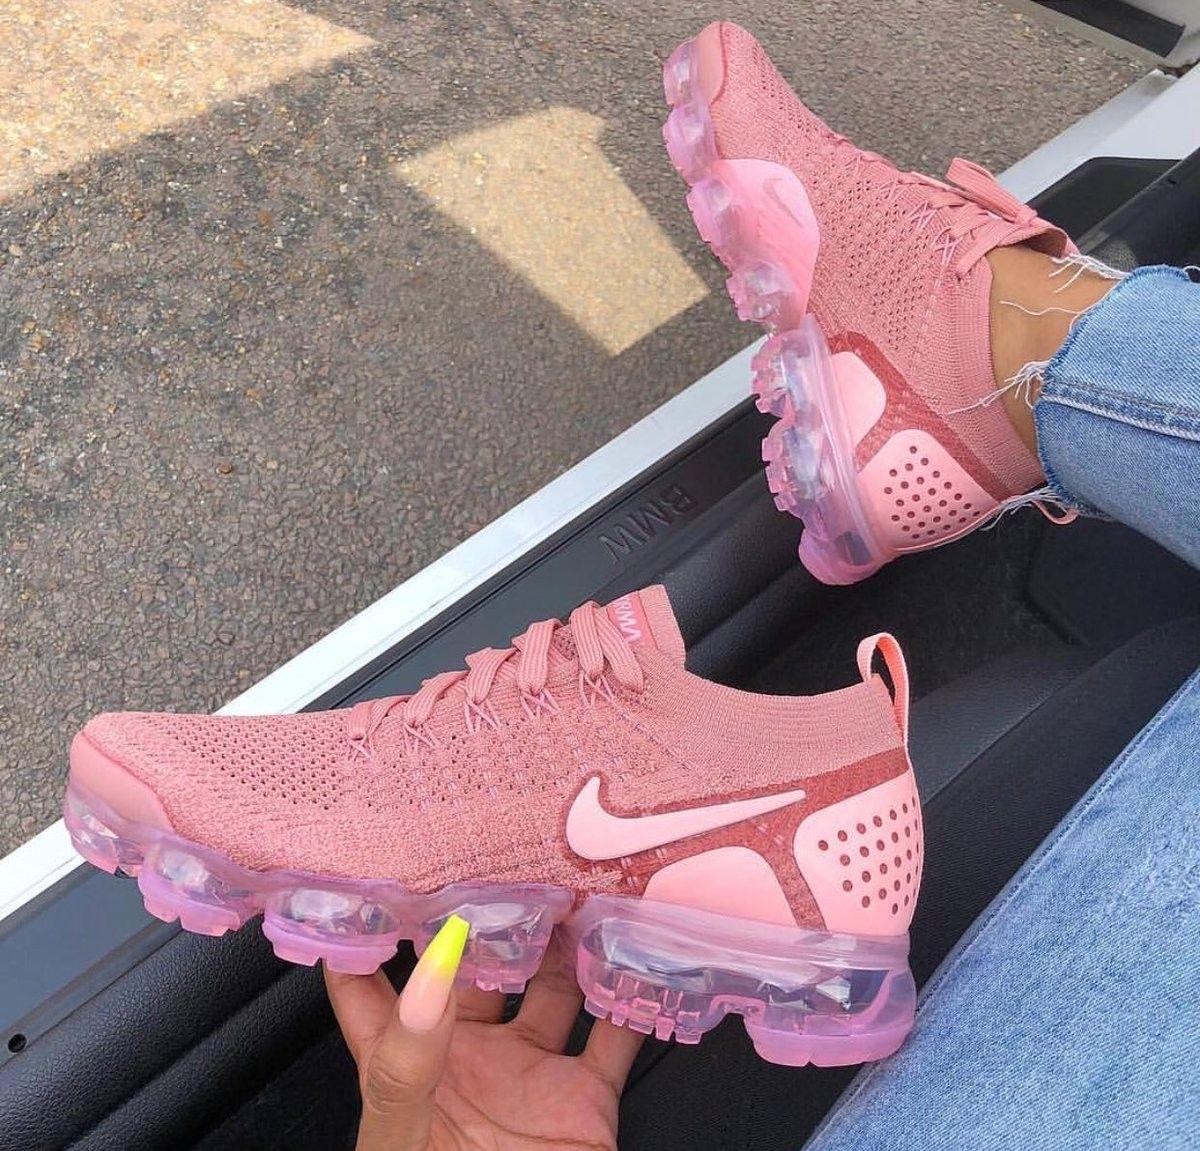 Pin schuheSneakers mode Laura von auf shoooesRosa nike 8nvmN0w